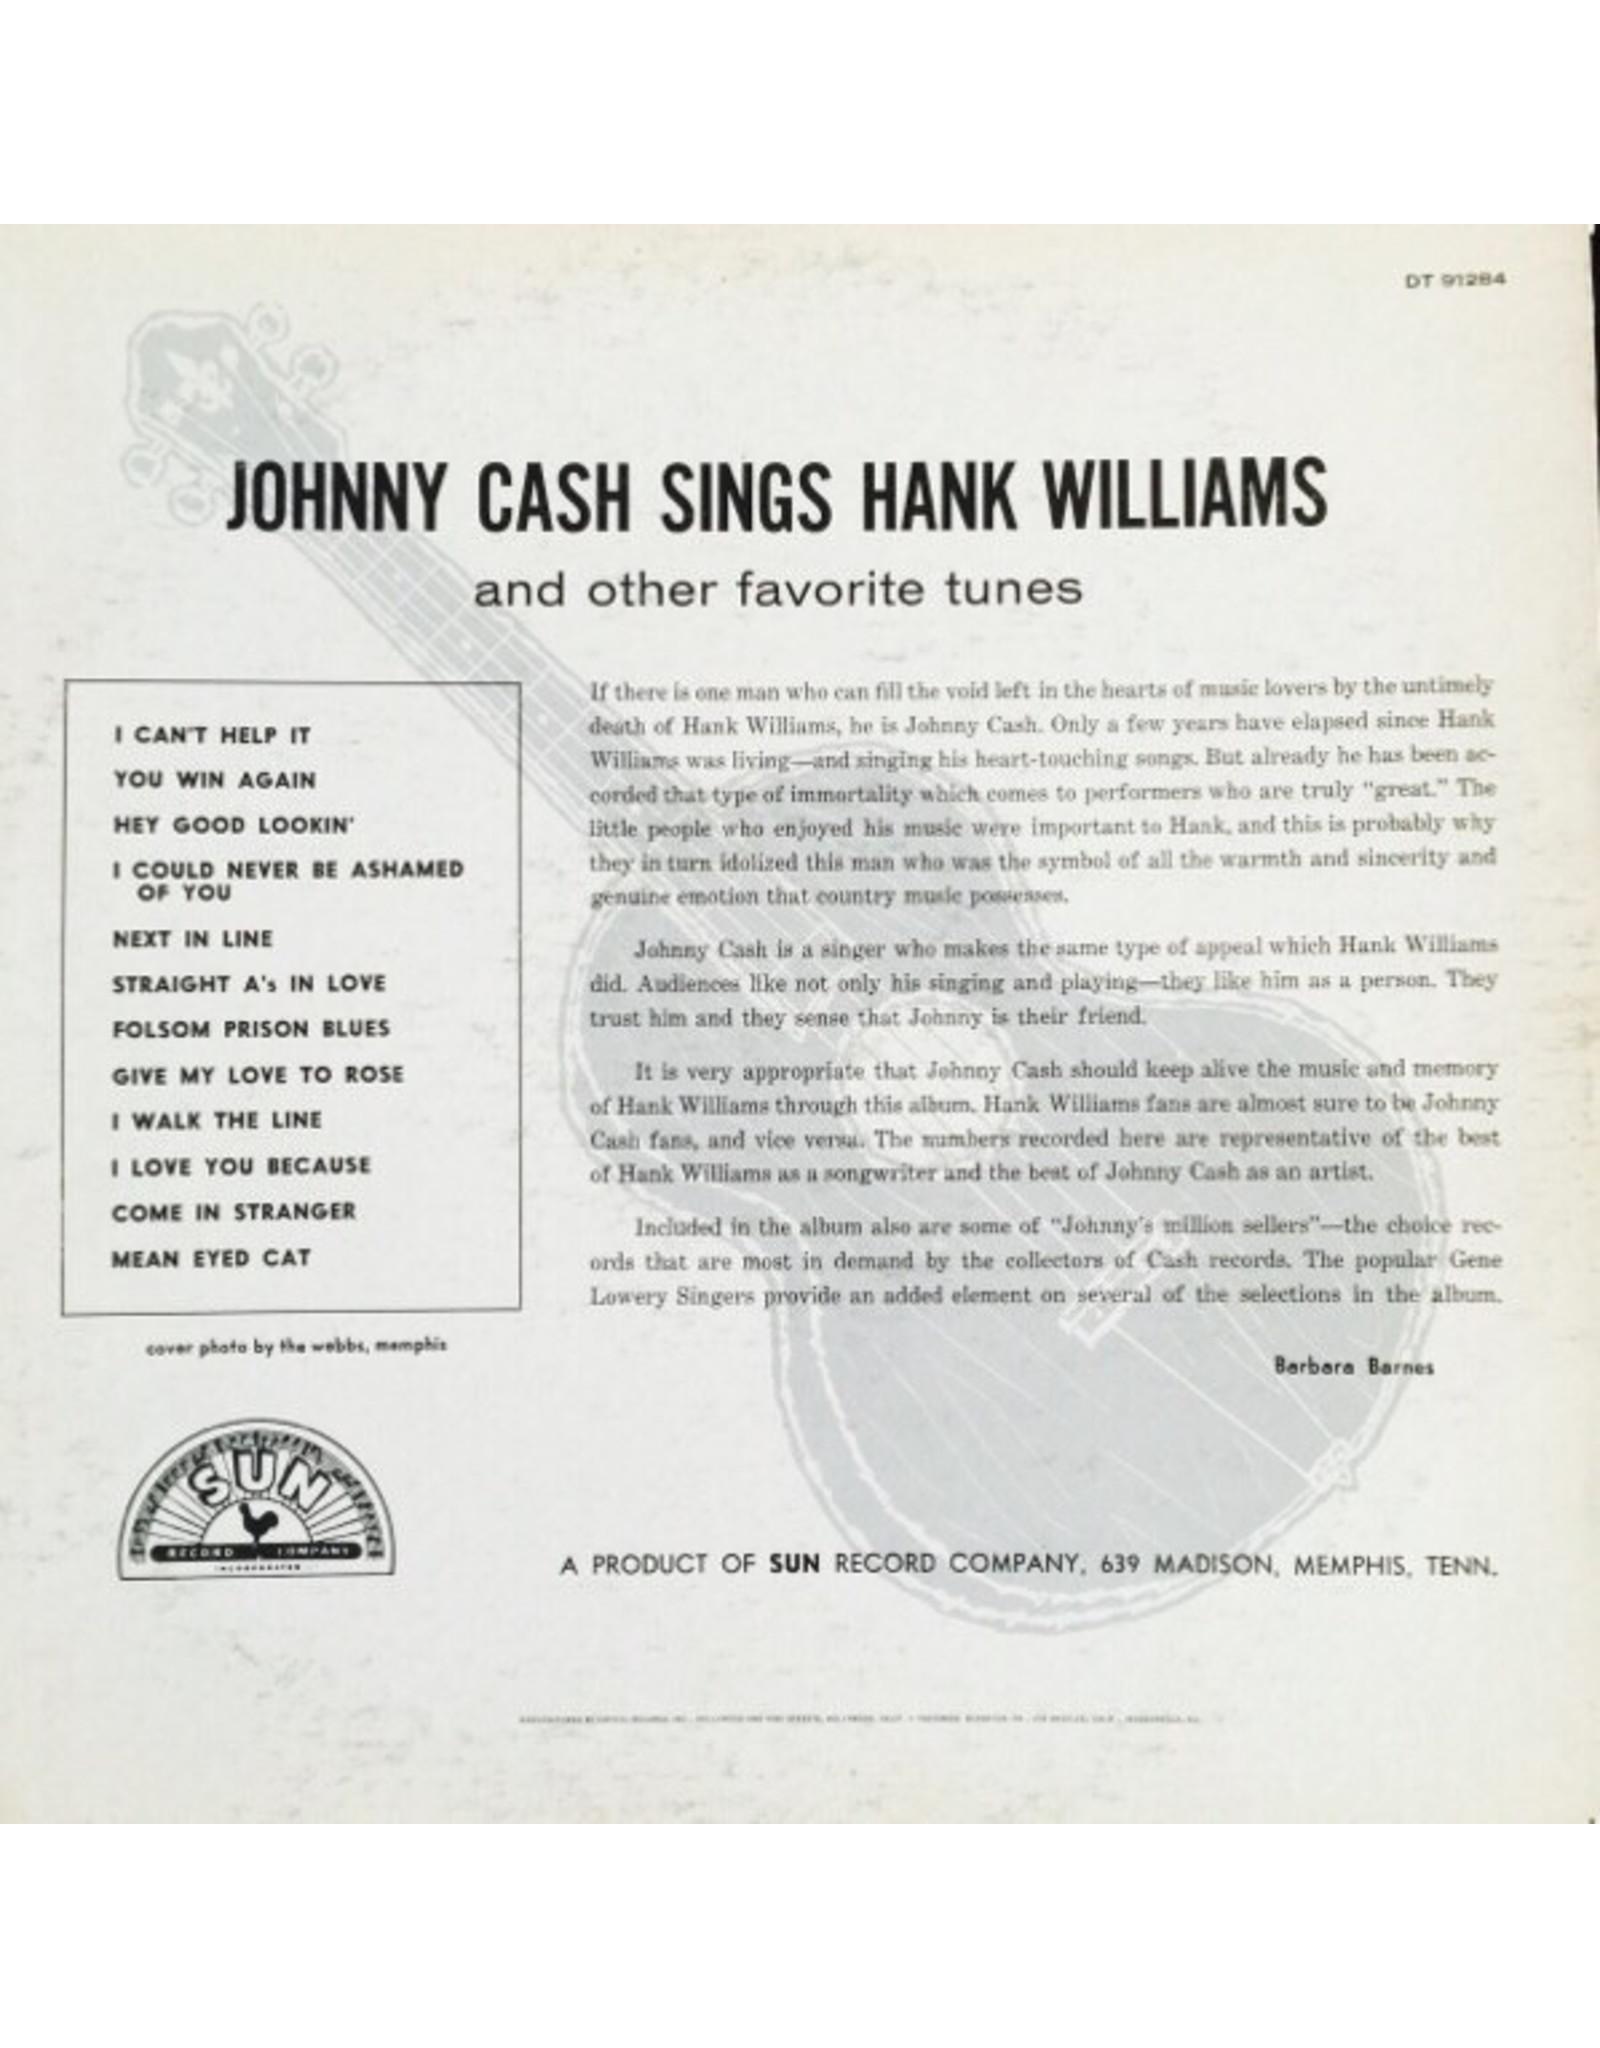 Johnny Cash - Johnny Cash Sings Hank Williams (Half Speed Master) [Sunset Orange Vinyl]